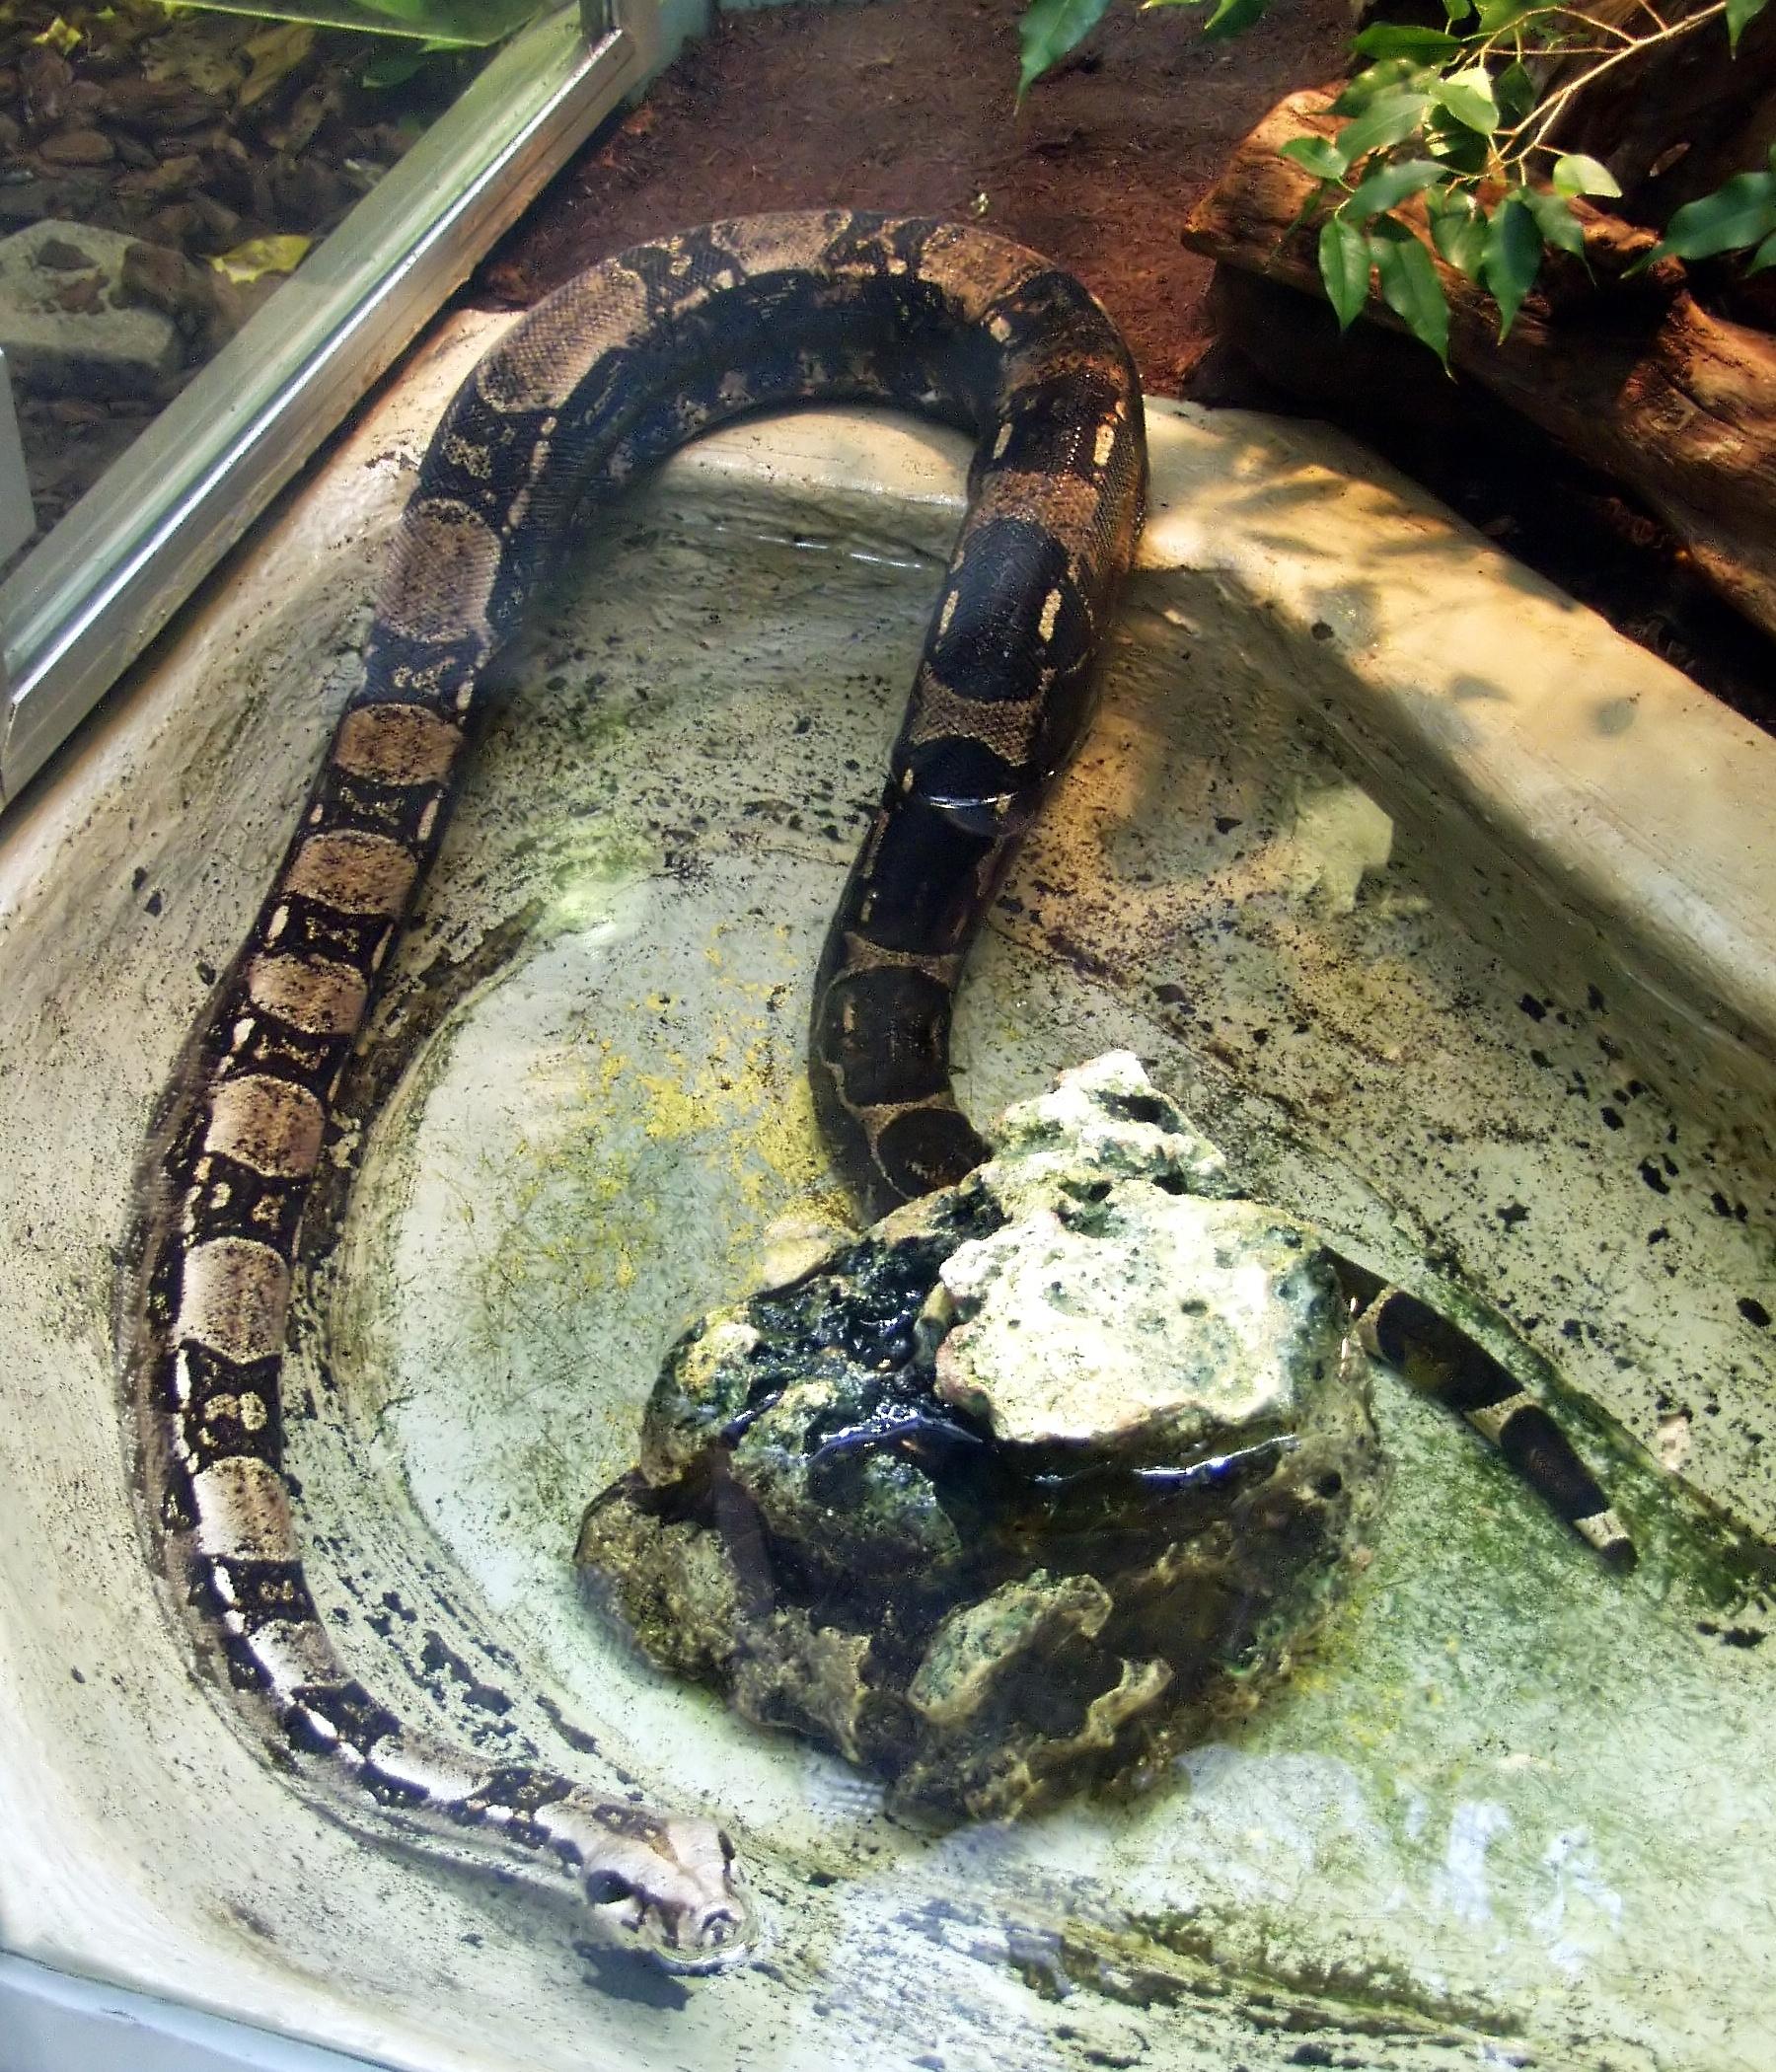 Boa Constrictor Pet a Boa Constrictor in a